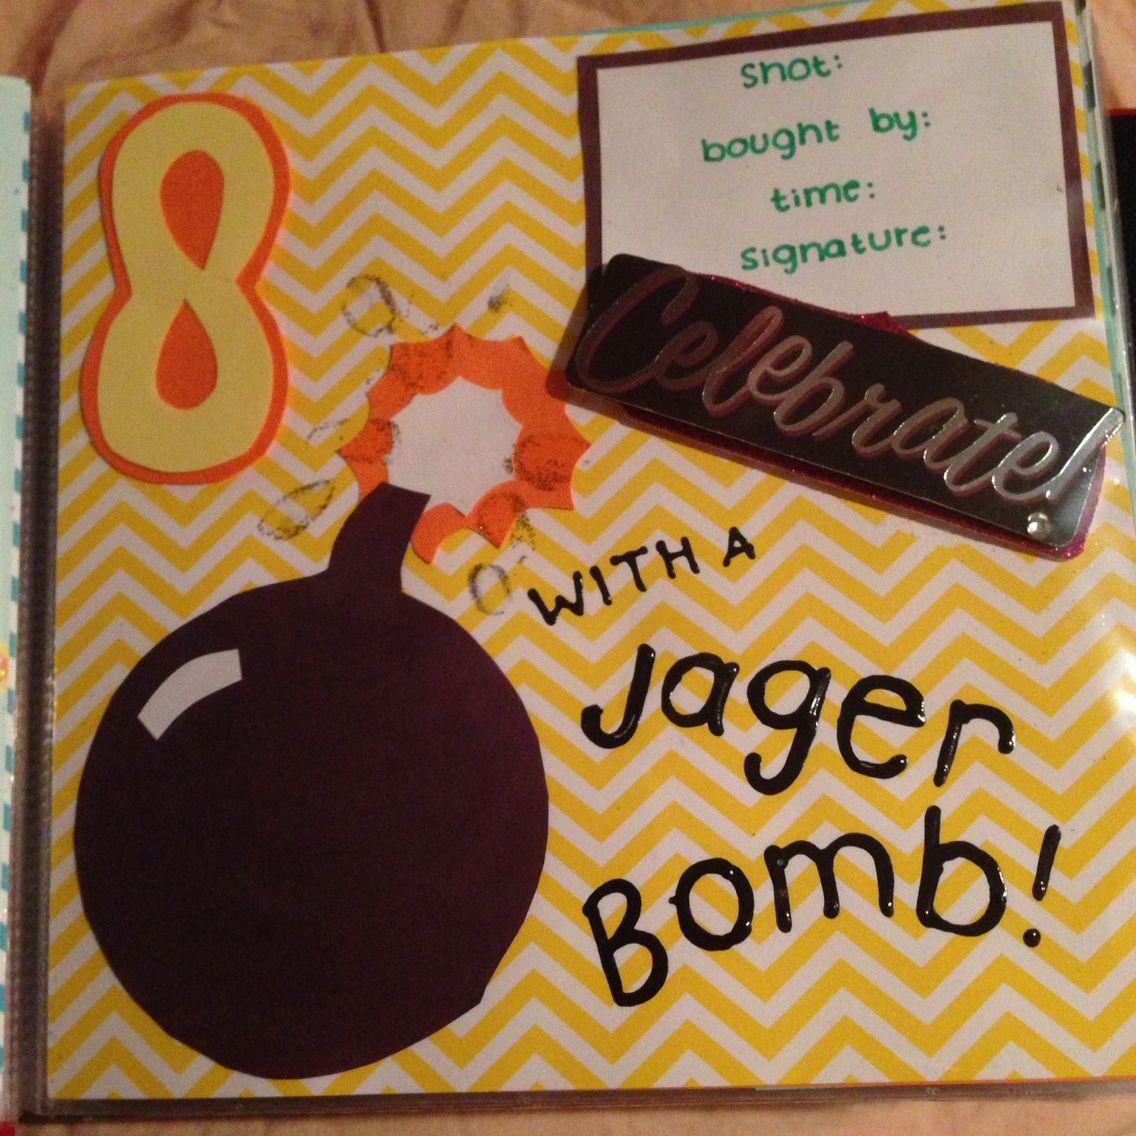 21st Birthday Shot Book #shotbook #21